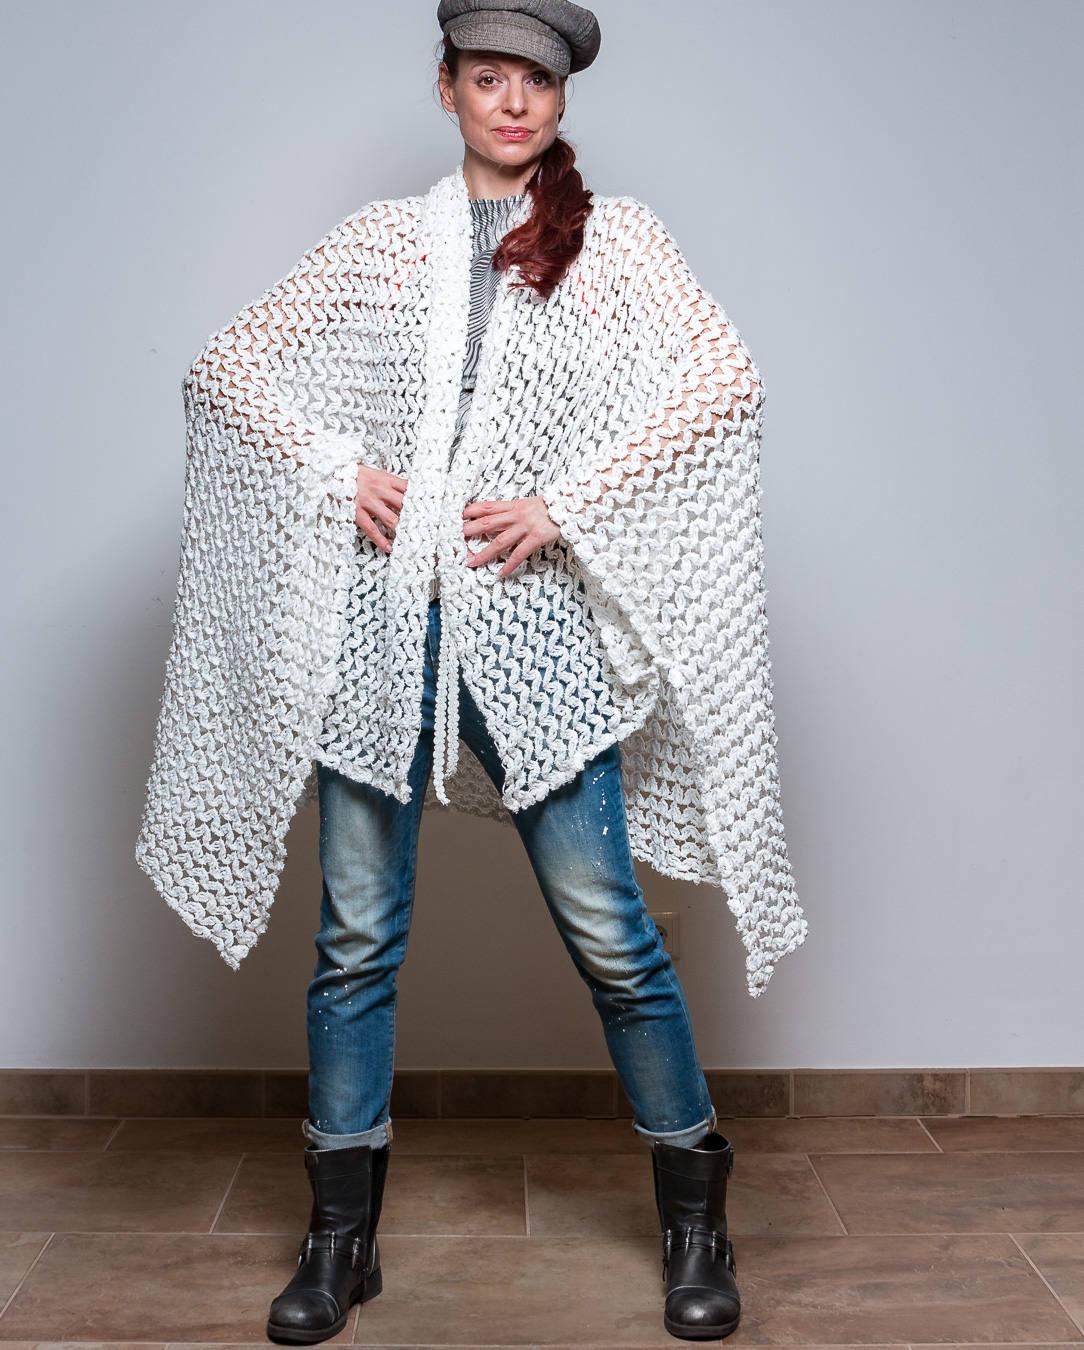 Strickjacke Weiß Sommer Cardigan 5